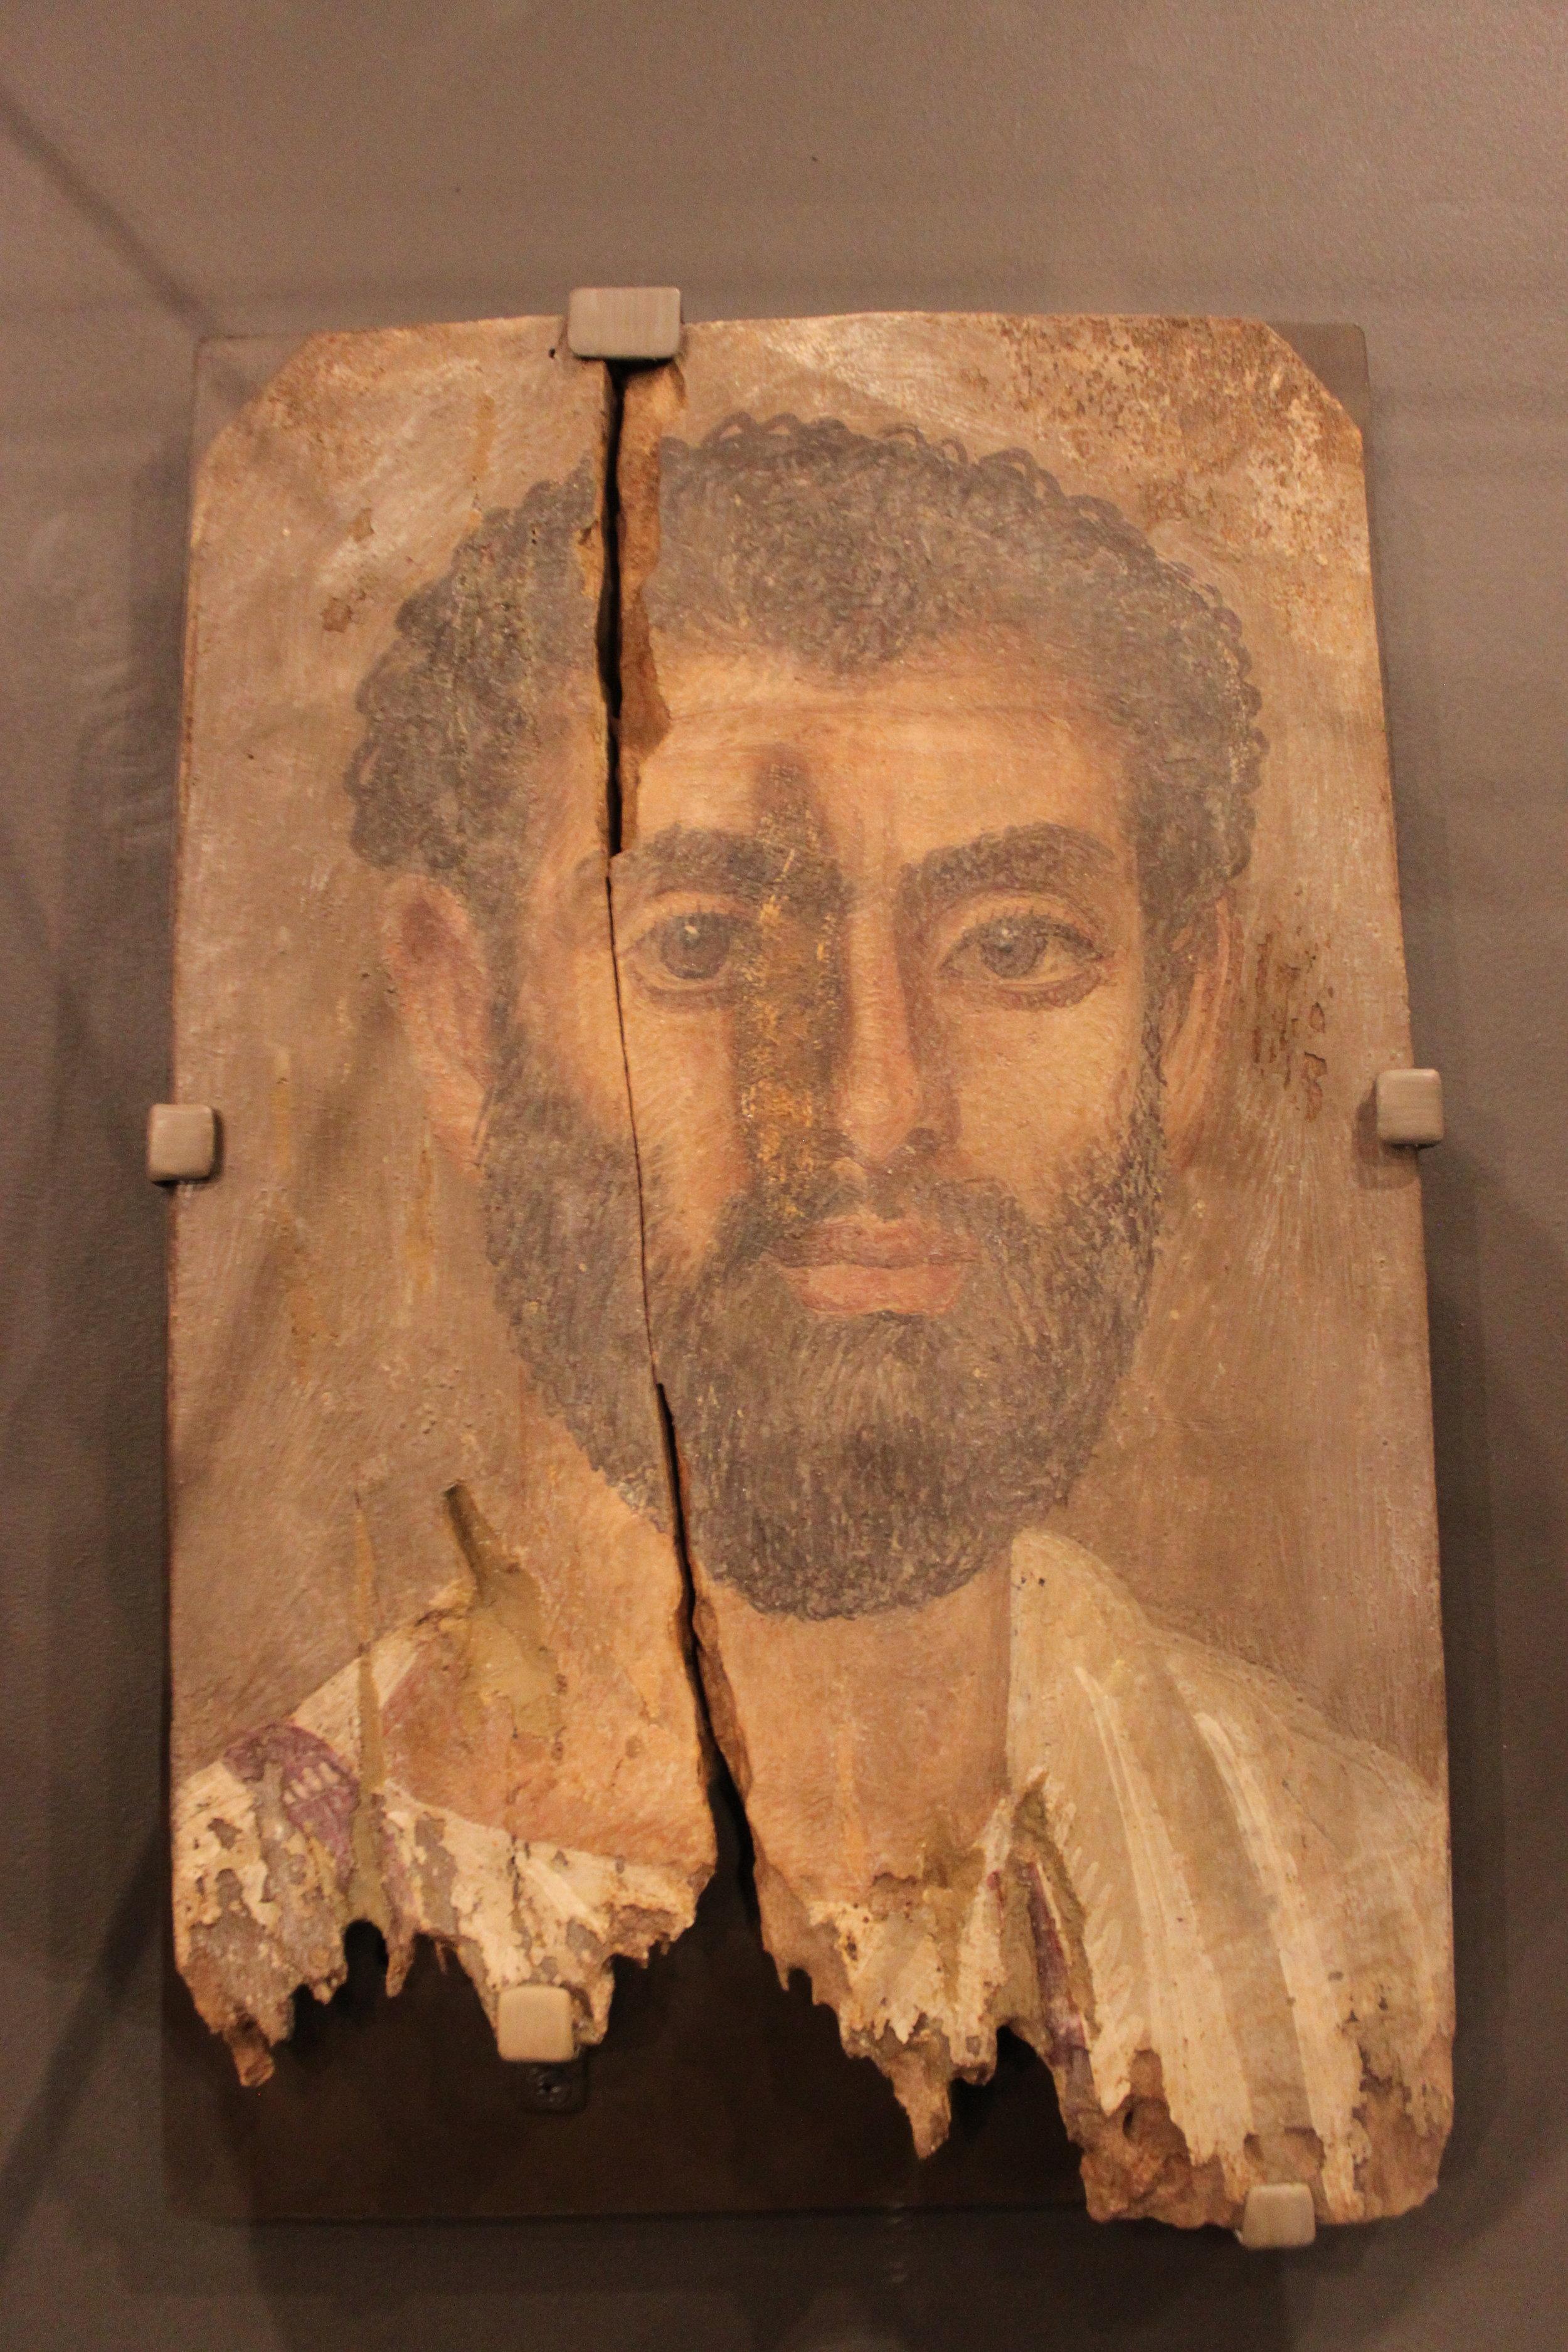 Mummy Portrait of Bearded Man - Roman period (30 BCE  - 295 CE)